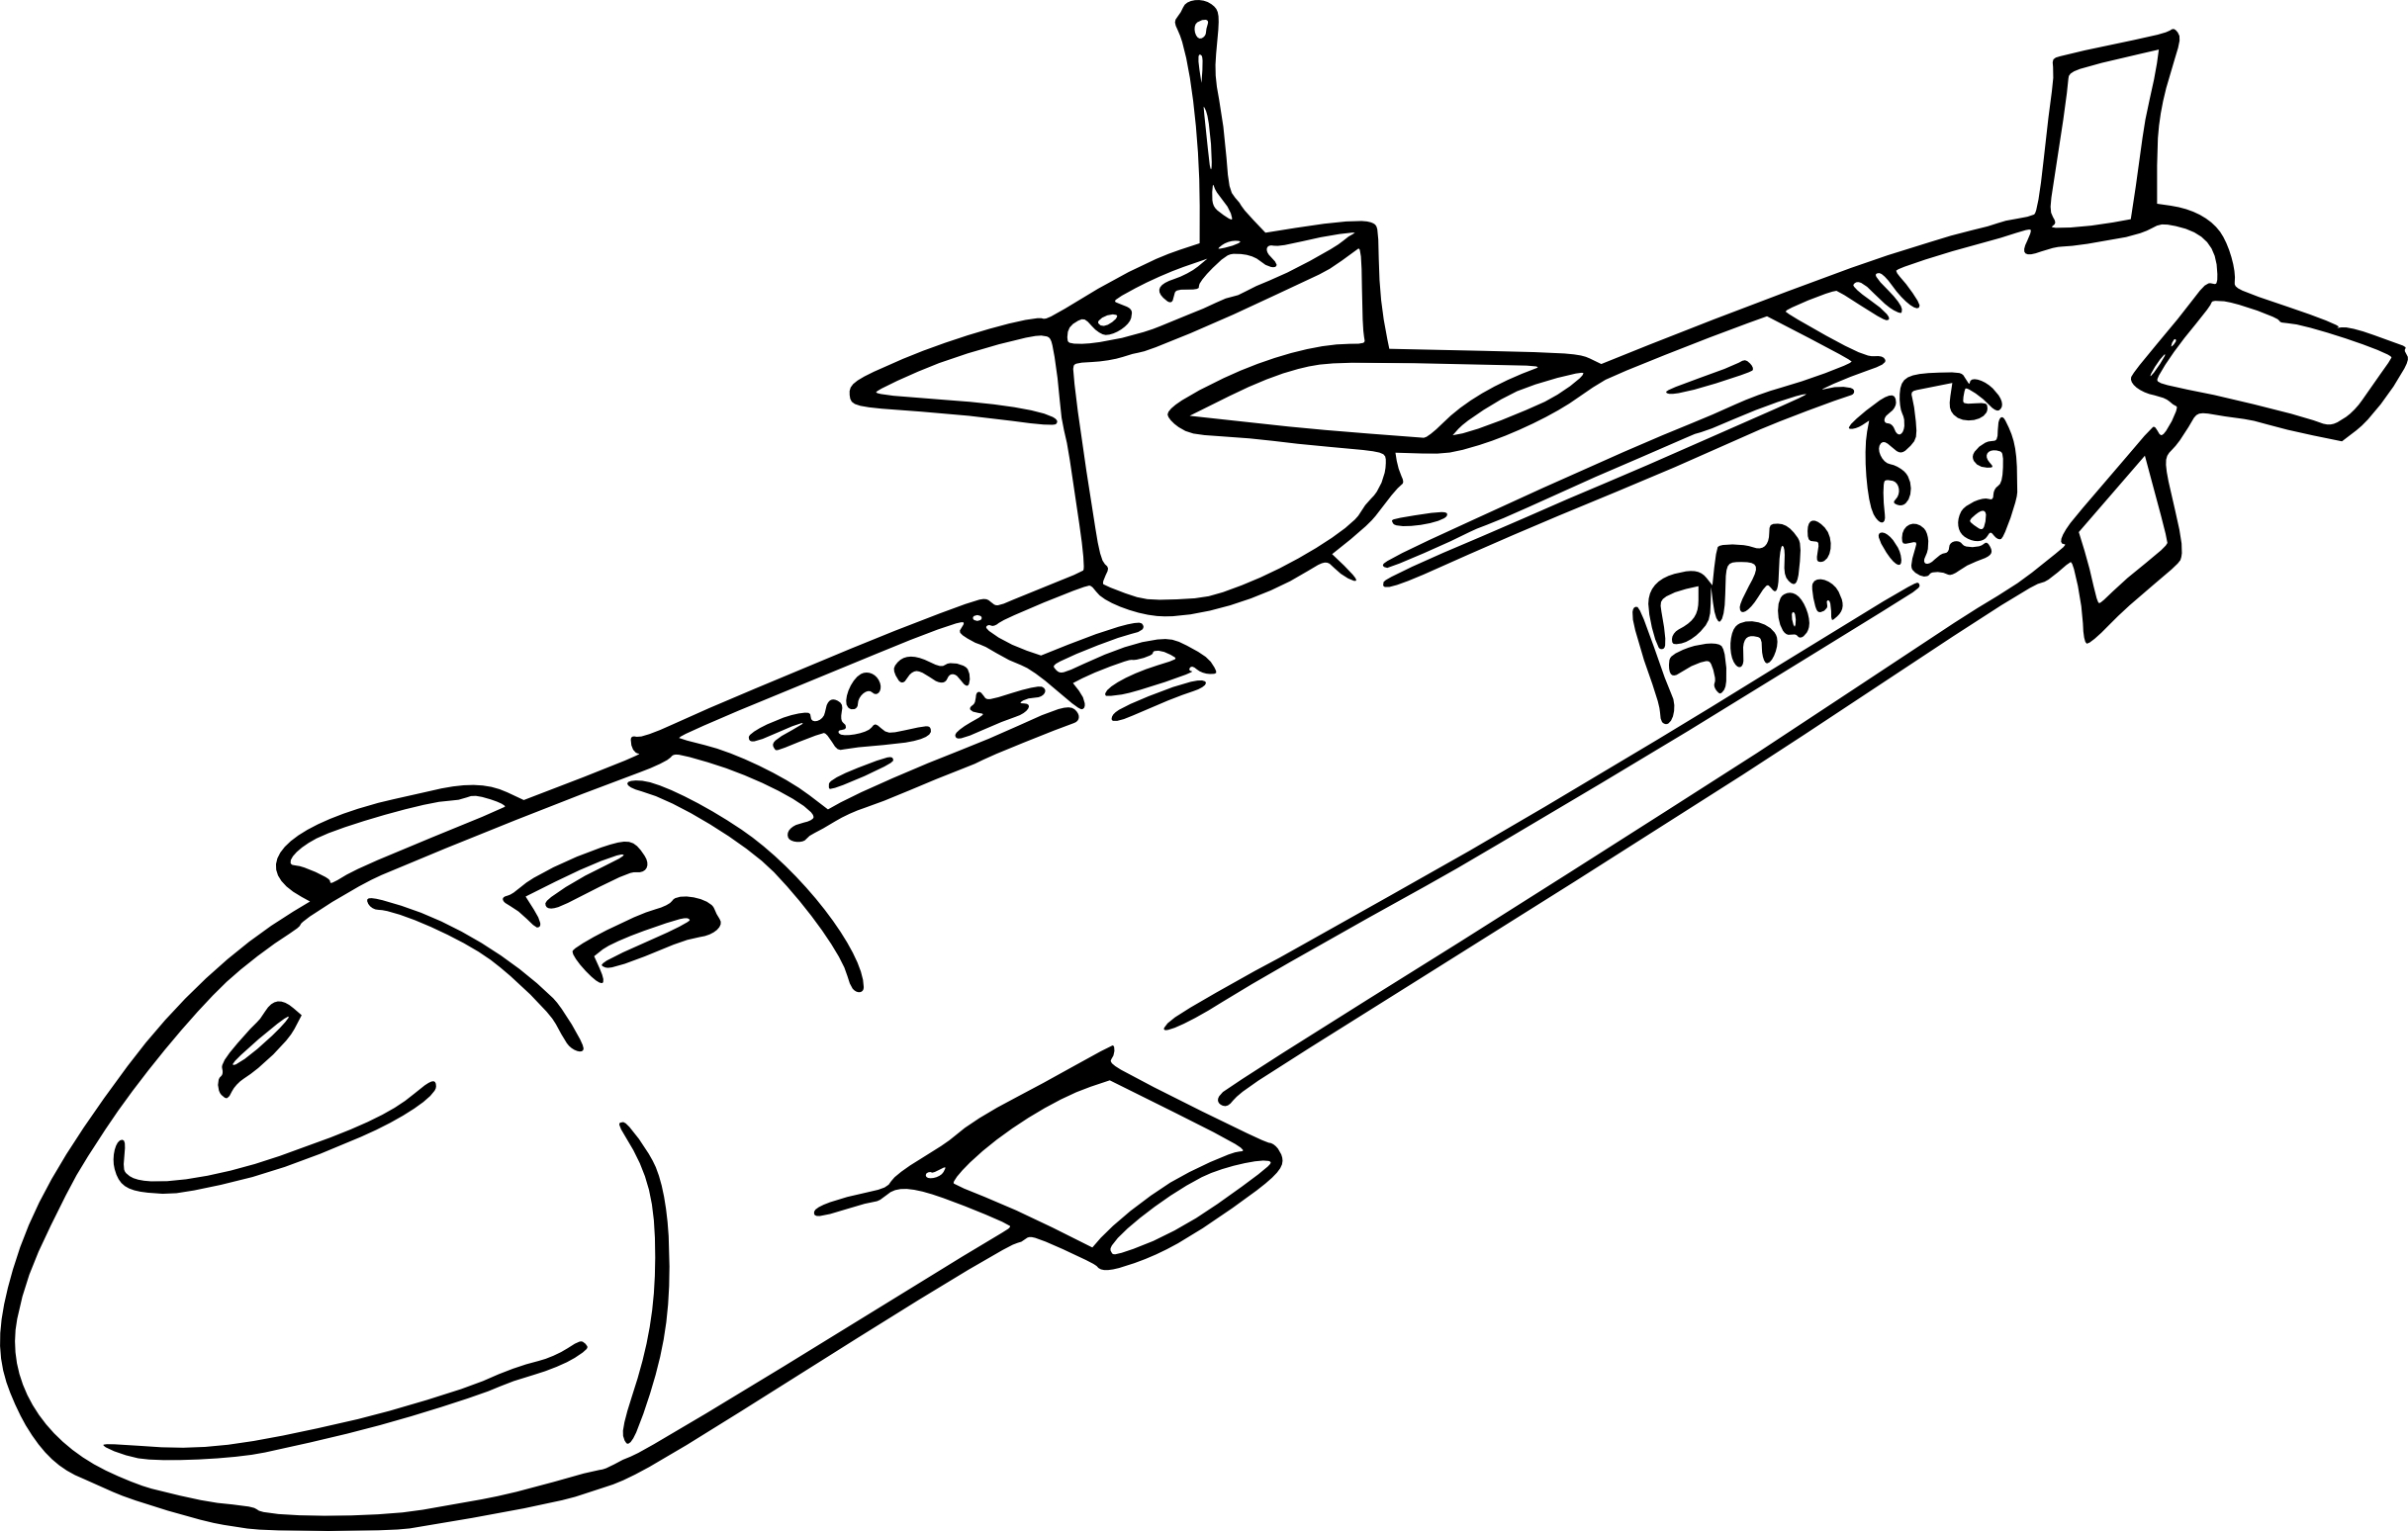 Coloriage sous marin imprimer - Coloriage sous marin ...